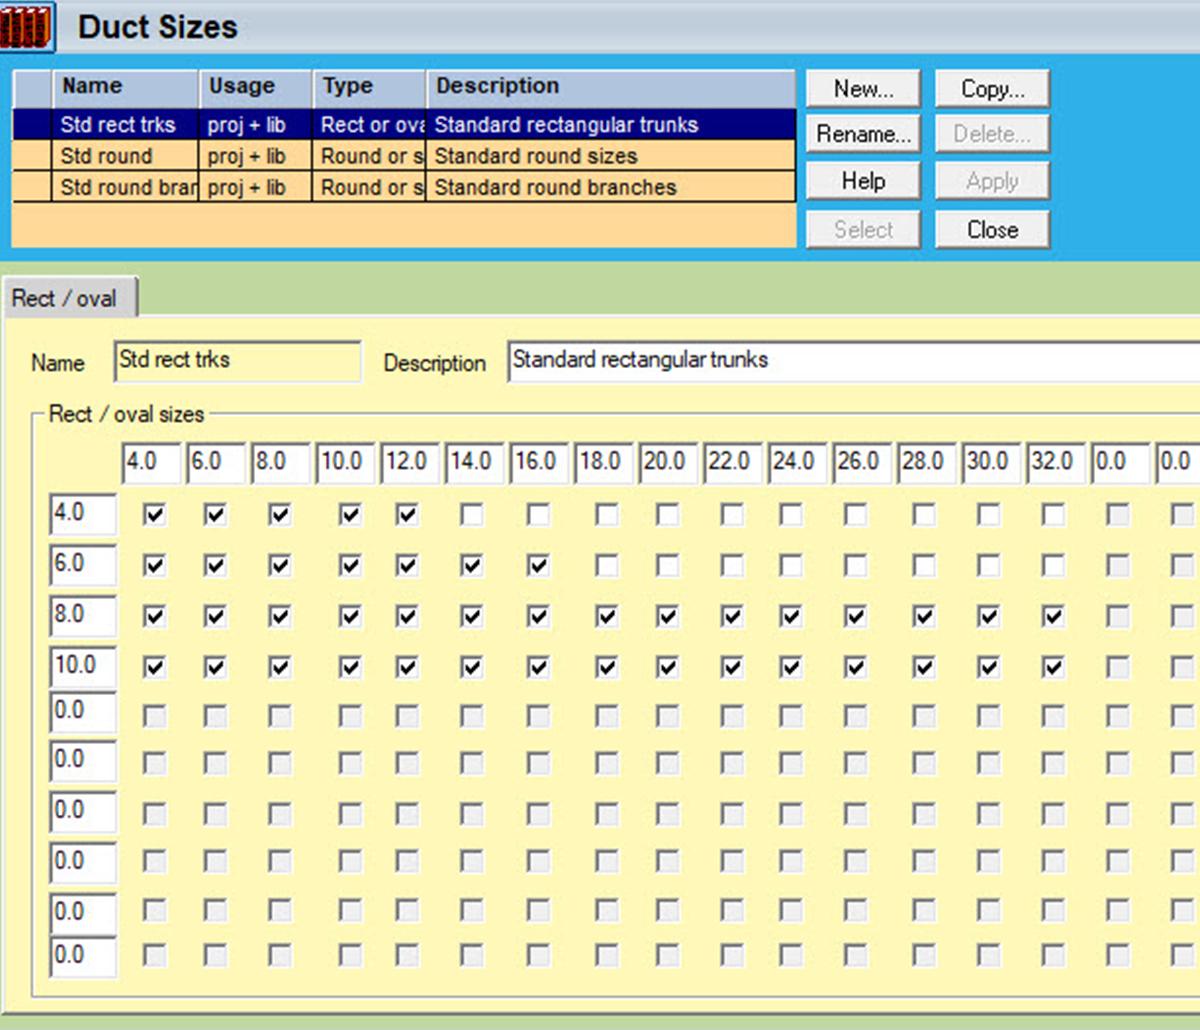 MiTek Wrightsoft Duct Placement Design Software - Screenshot of Wrightsoft duct placement software